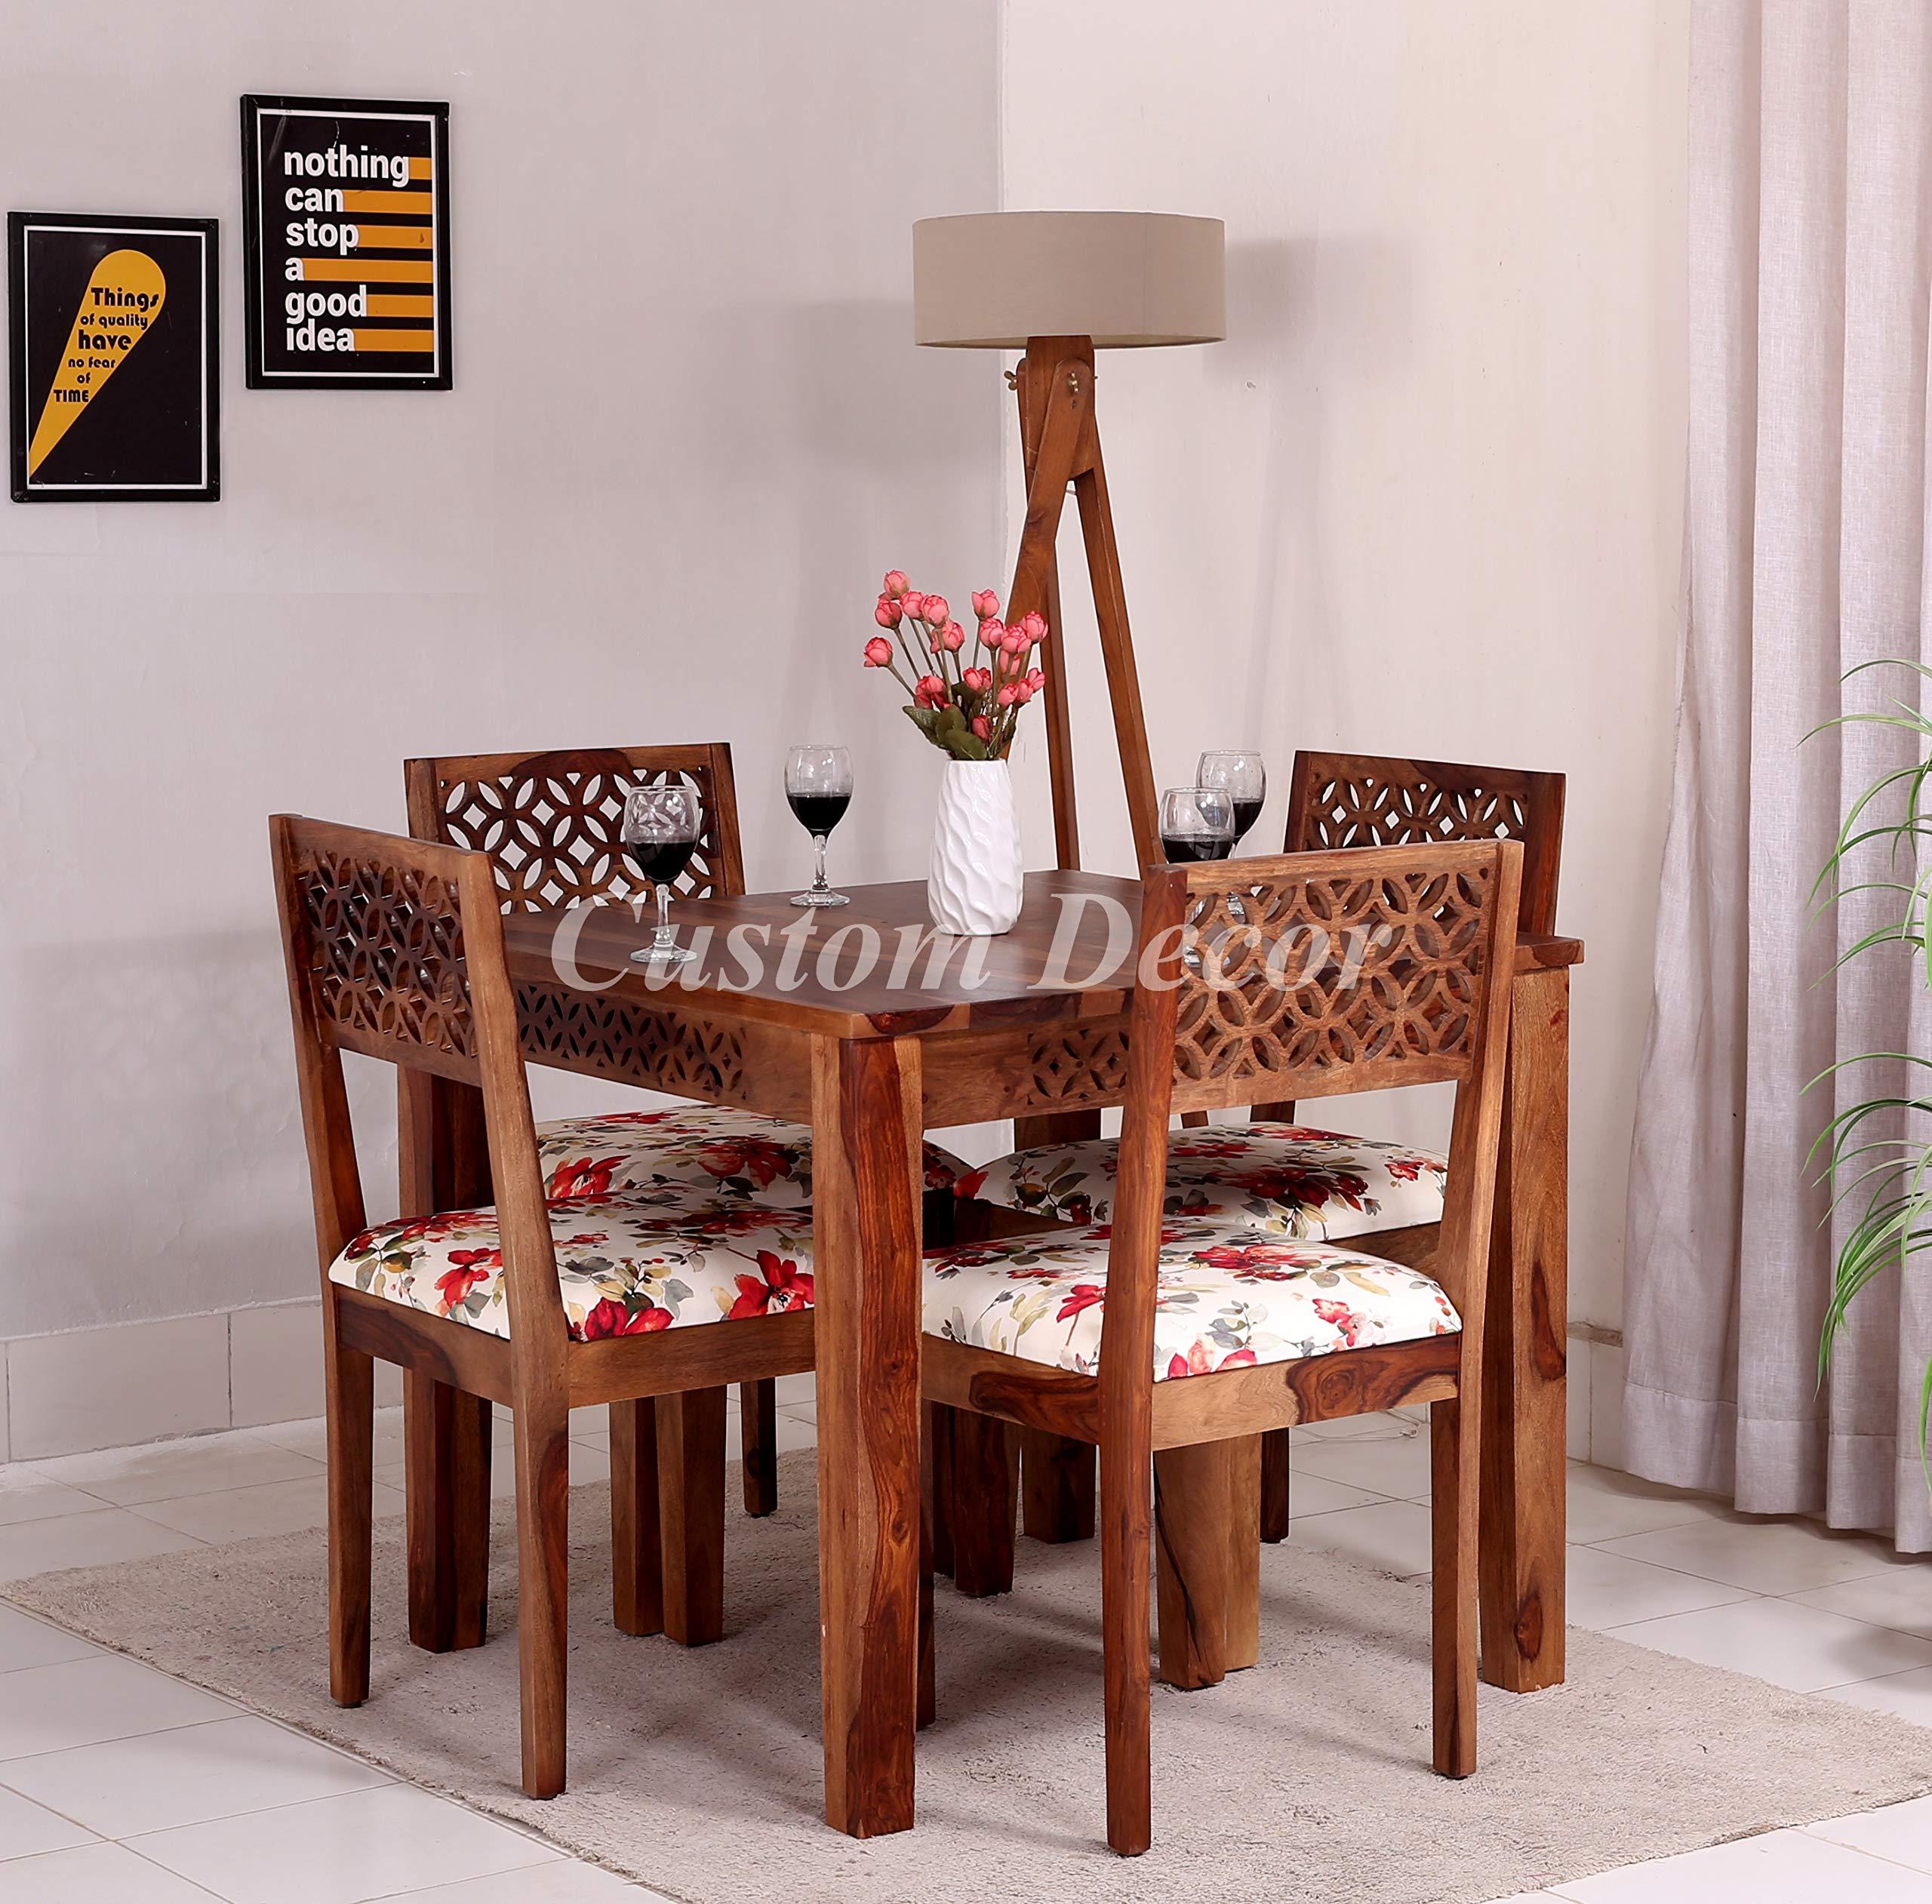 Custom Decor CNC Cuting Sheesham Wood Dining Table 9 Seater ...